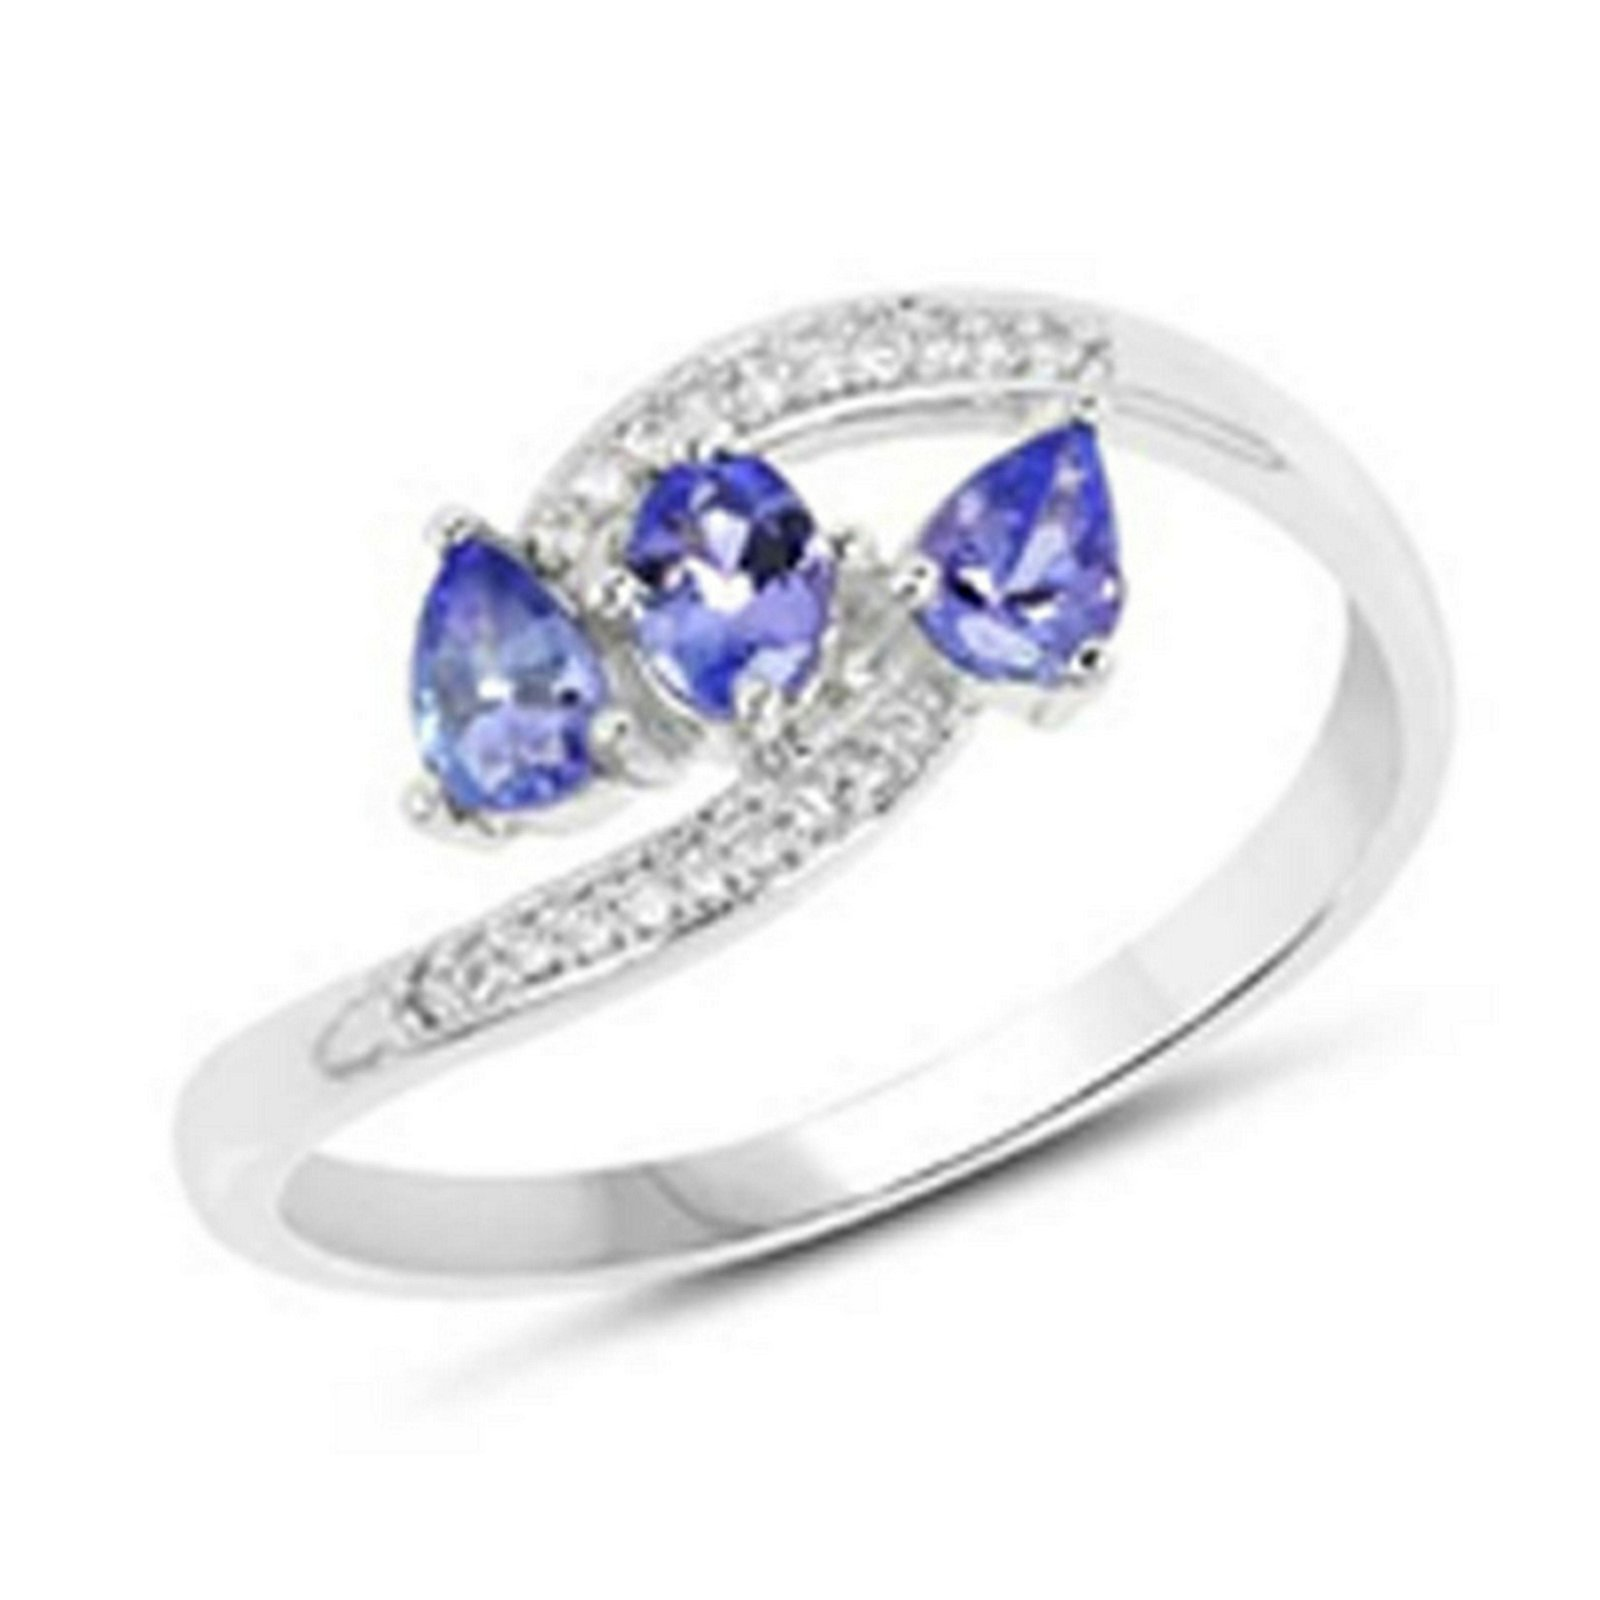 *Fine Jewelry 14 KT White Gold, 2.16CT Tanzanite And